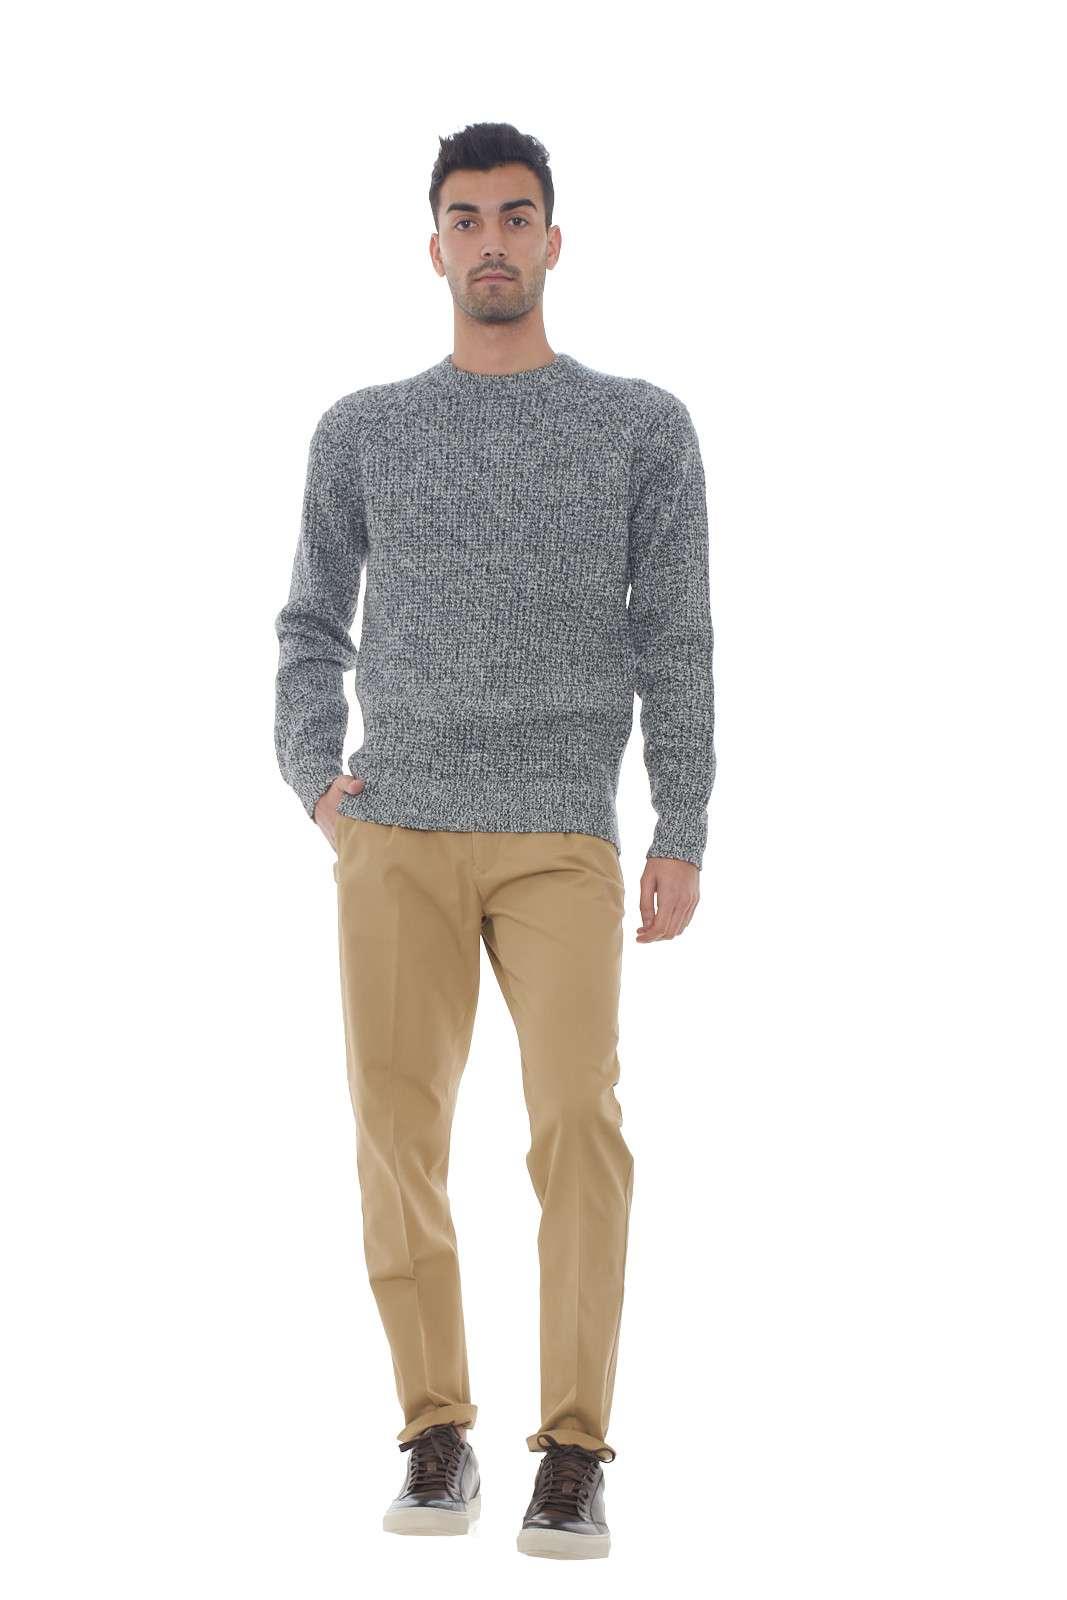 https://www.parmax.com/media/catalog/product/a/i/AI-outlet_parmax-maglia-uomo-Calvin-Klein-K10K104582-D.jpg